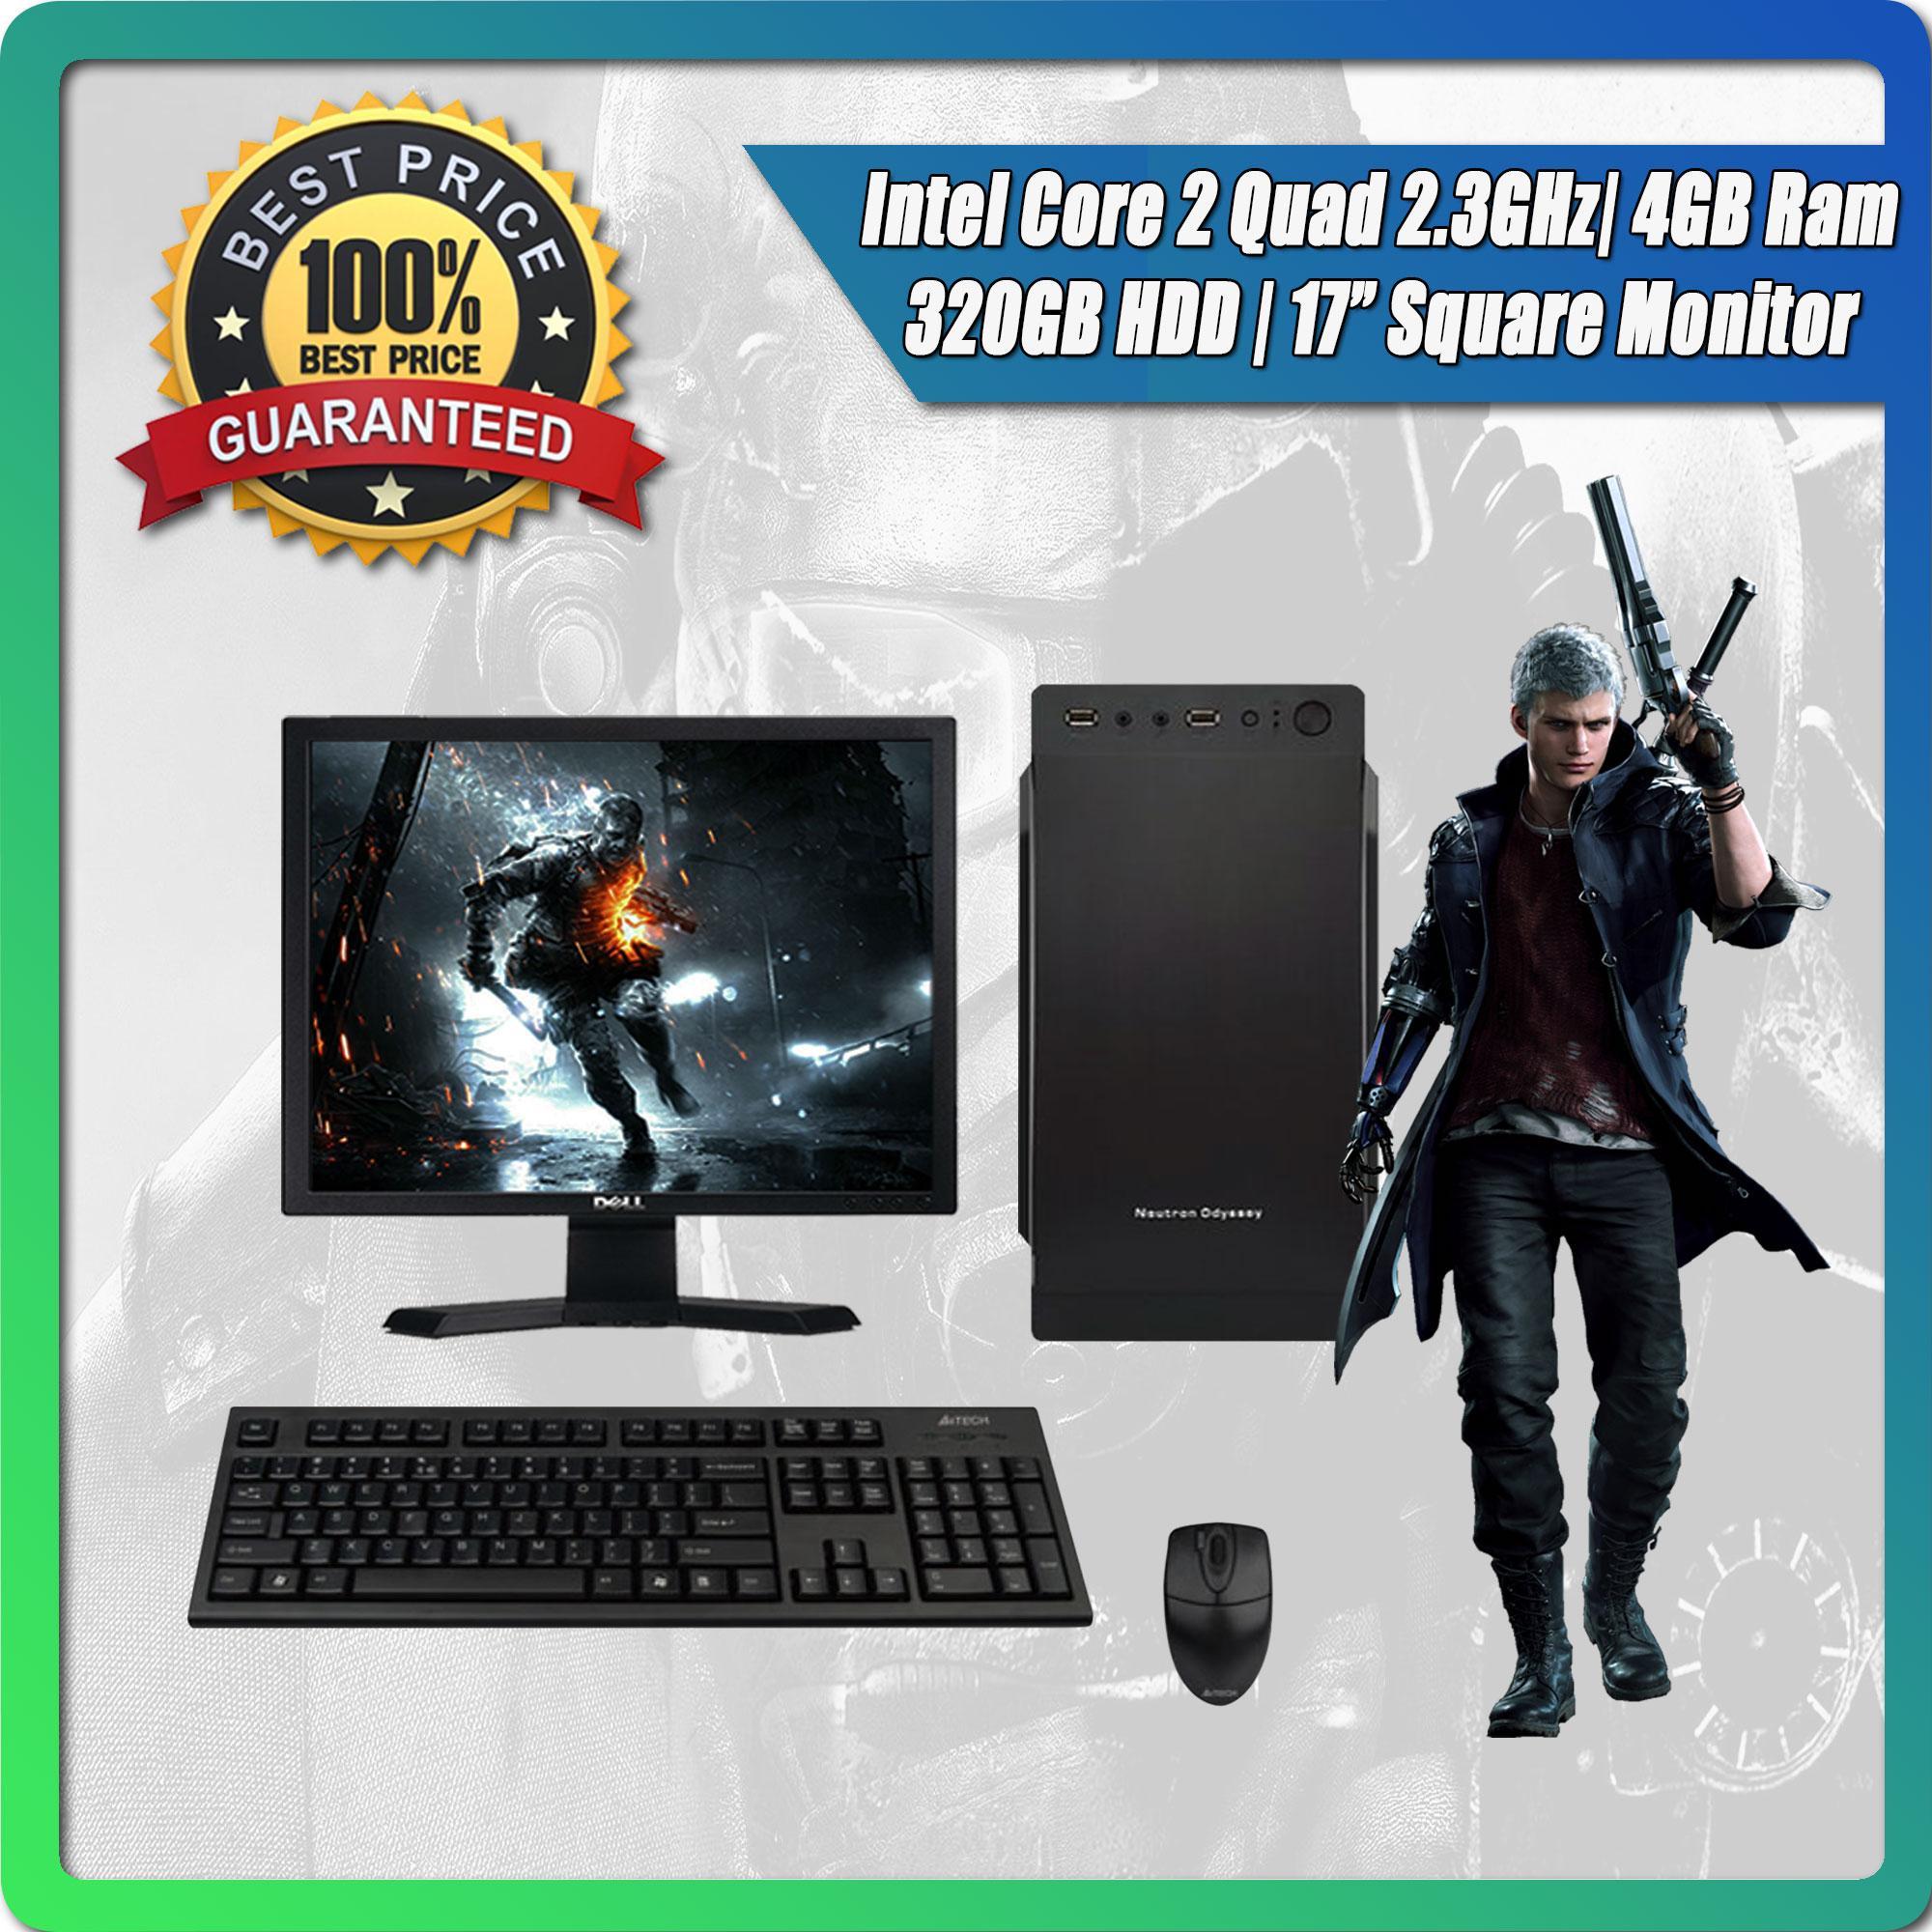 Intel Core 2 Quad Q8200 2 3GHz / 4GB Ram / 320GB HDD / 17